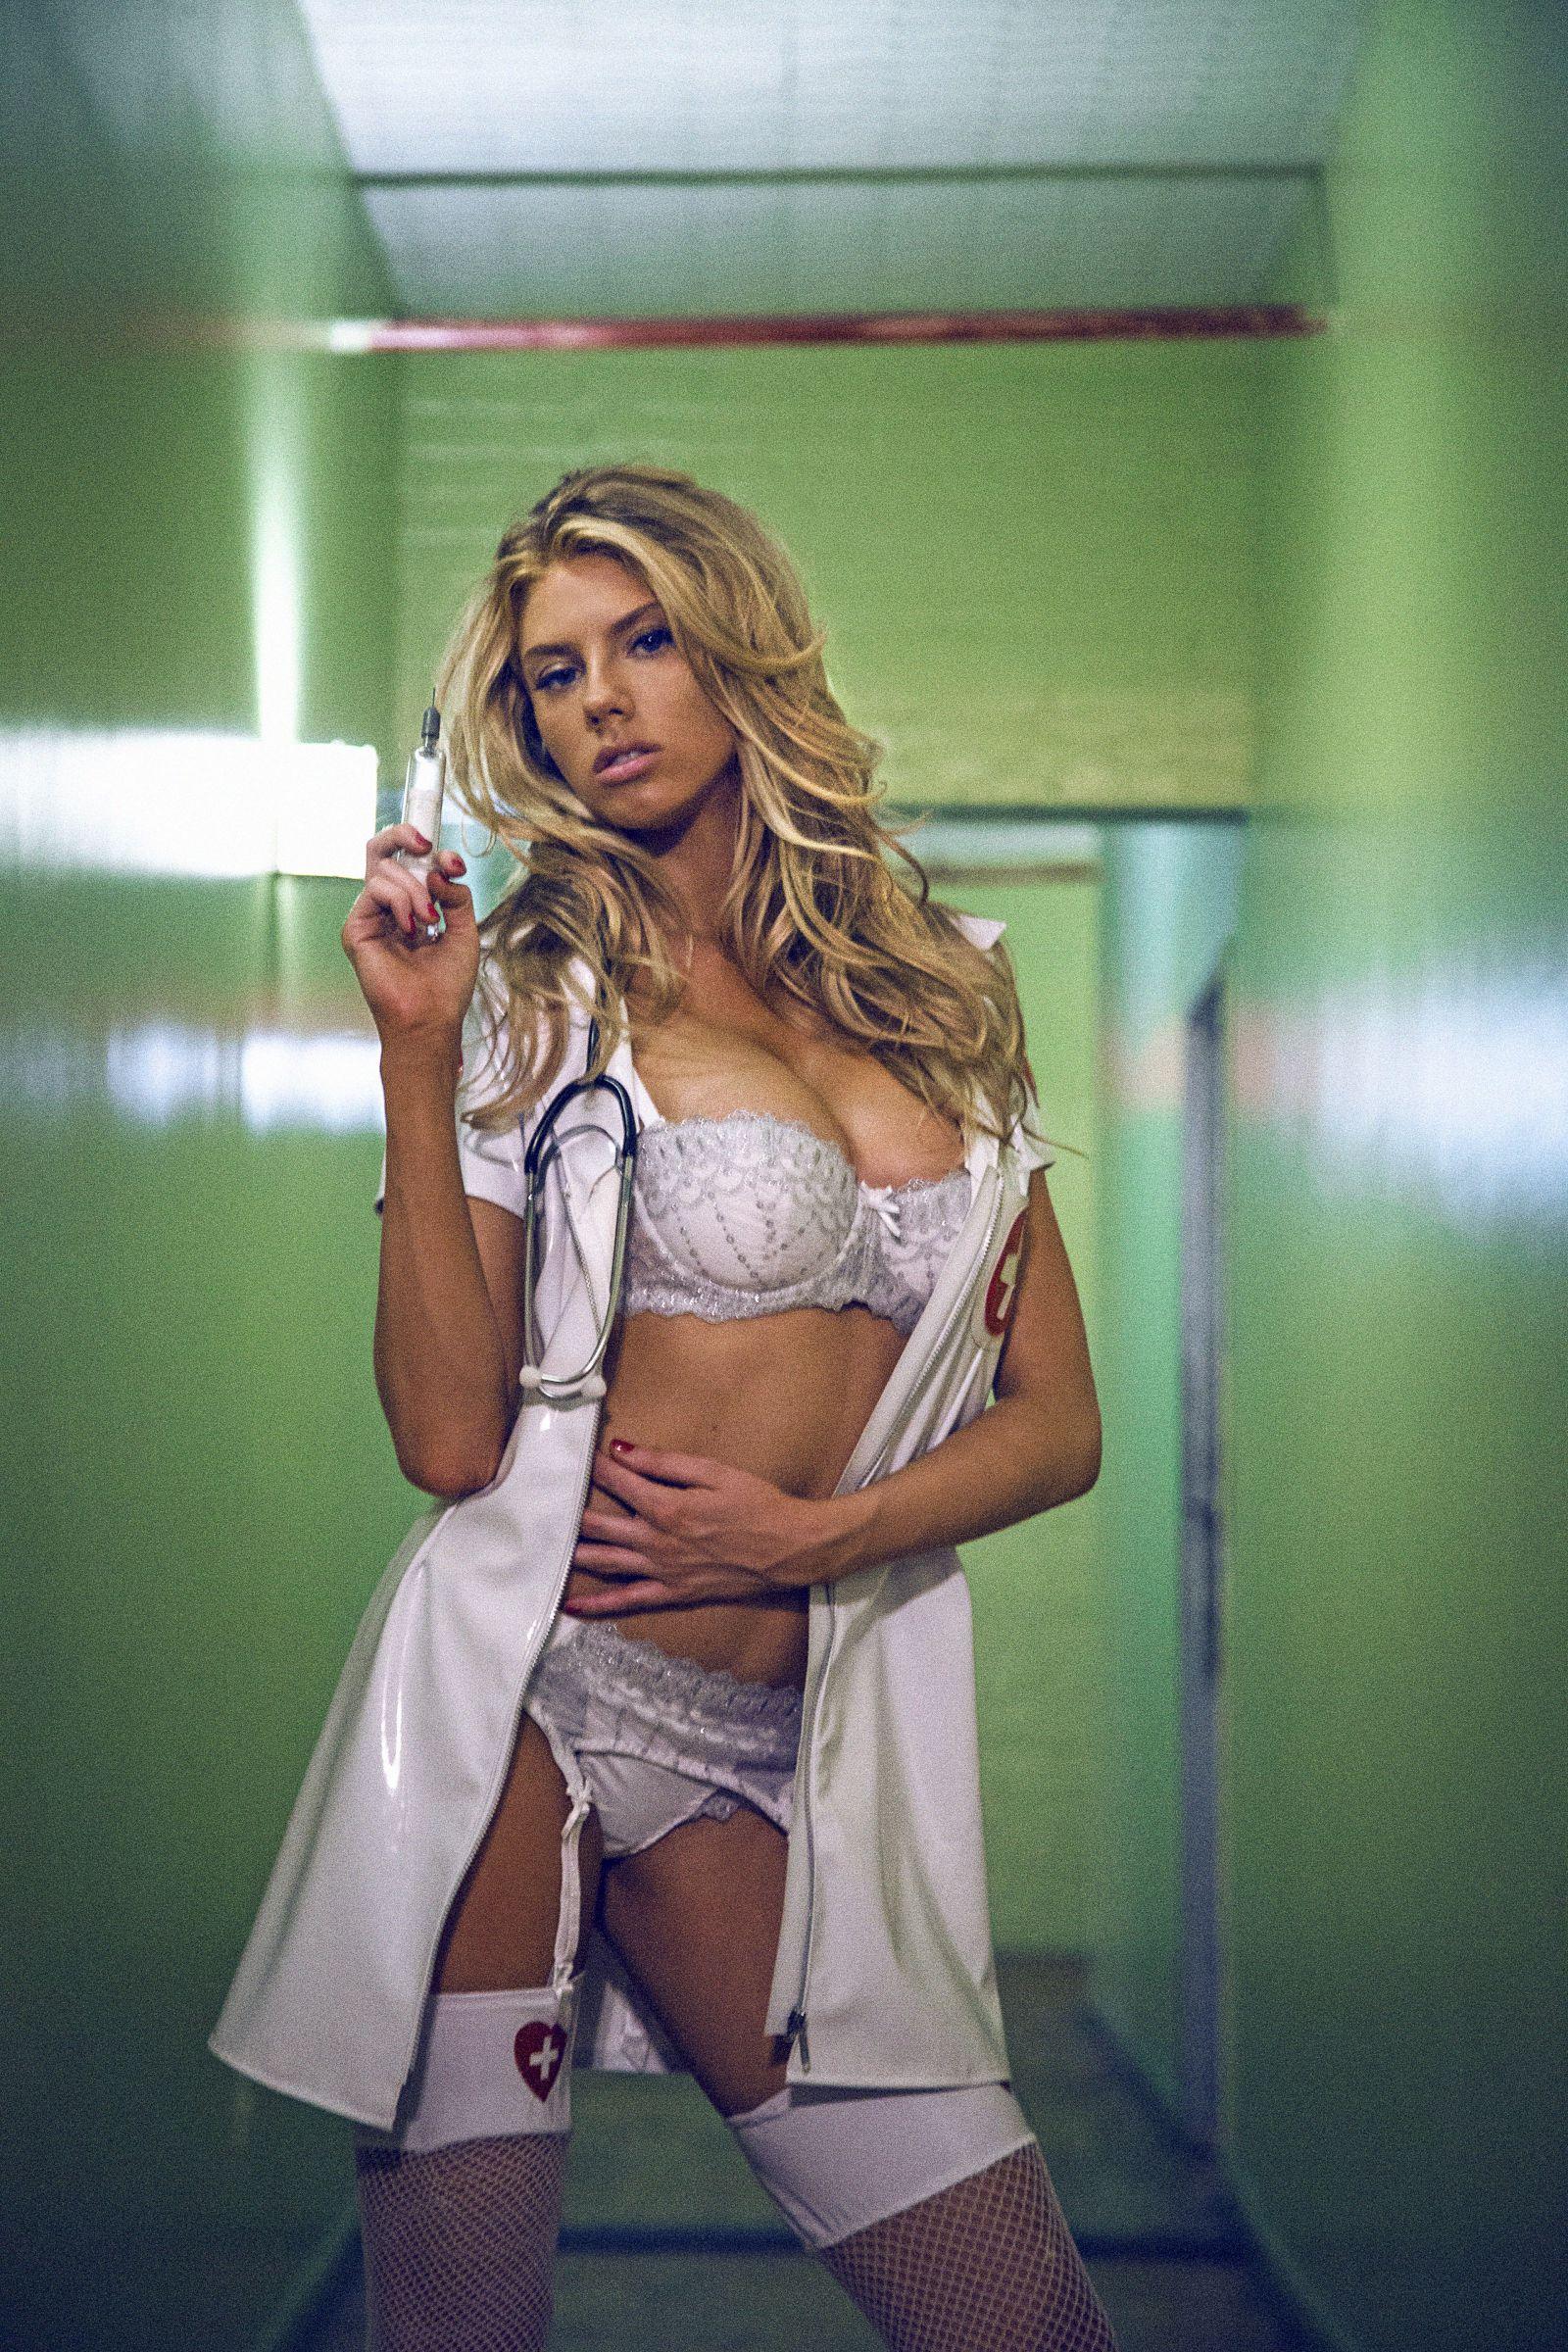 Шарлотта МакКинни / Charlotte McKinney for Galore Magazine